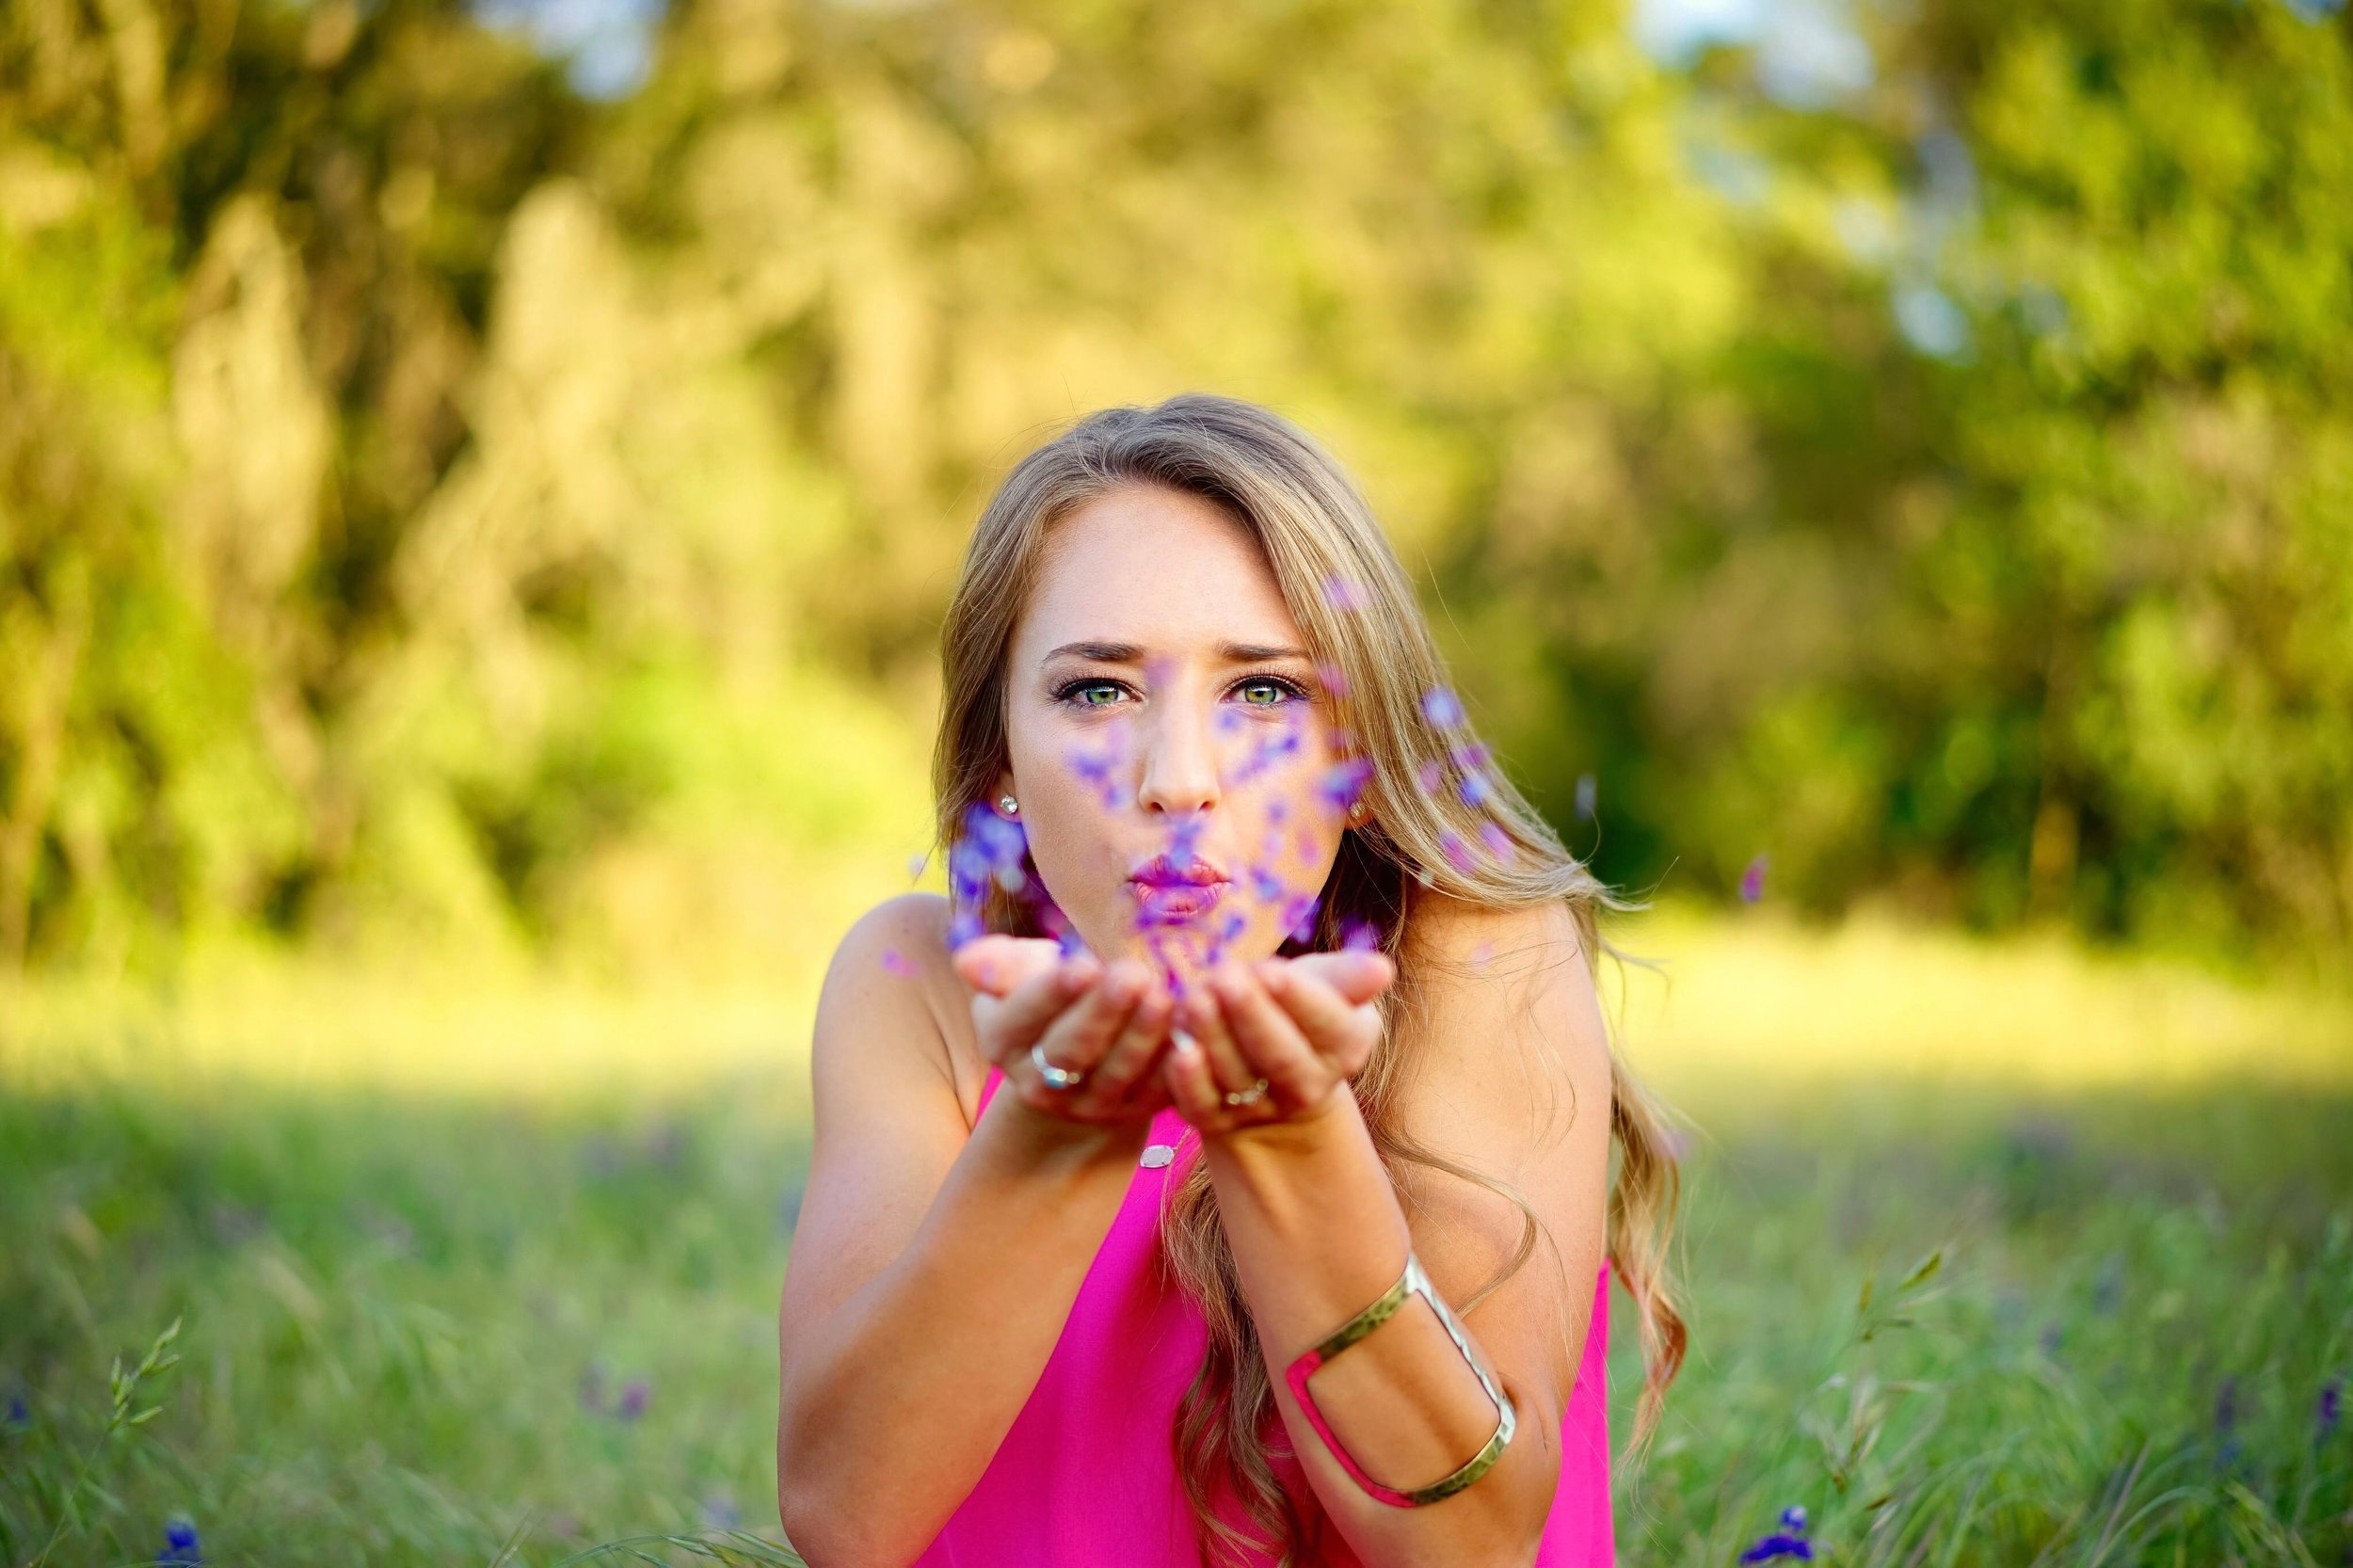 girl with confetti.jpg